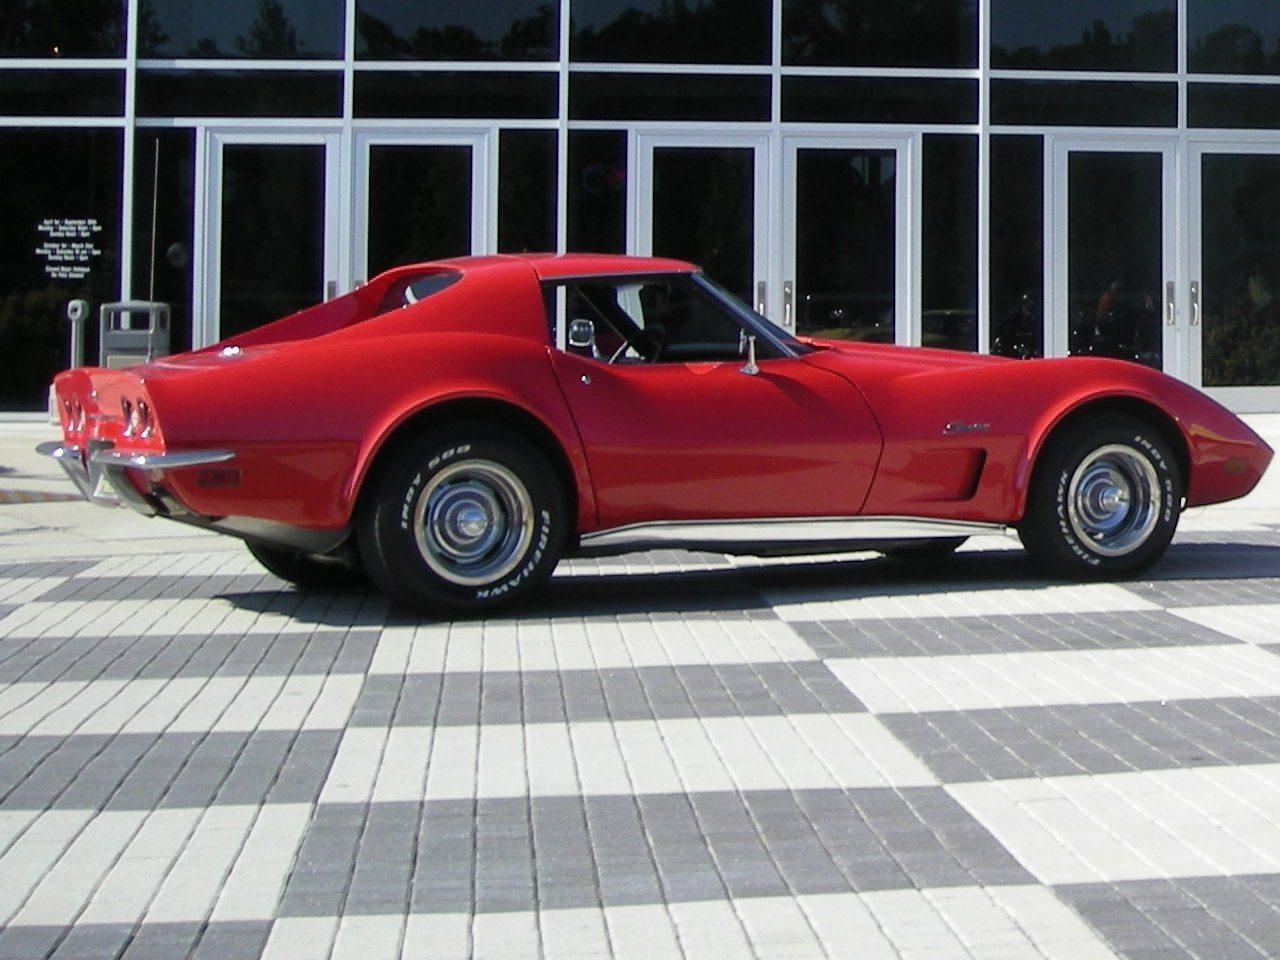 Chevrolet Latest Models >> 1973 C3 Corvette | Ultimate Guide (Overview, Specs, VIN Info, Performance & More)